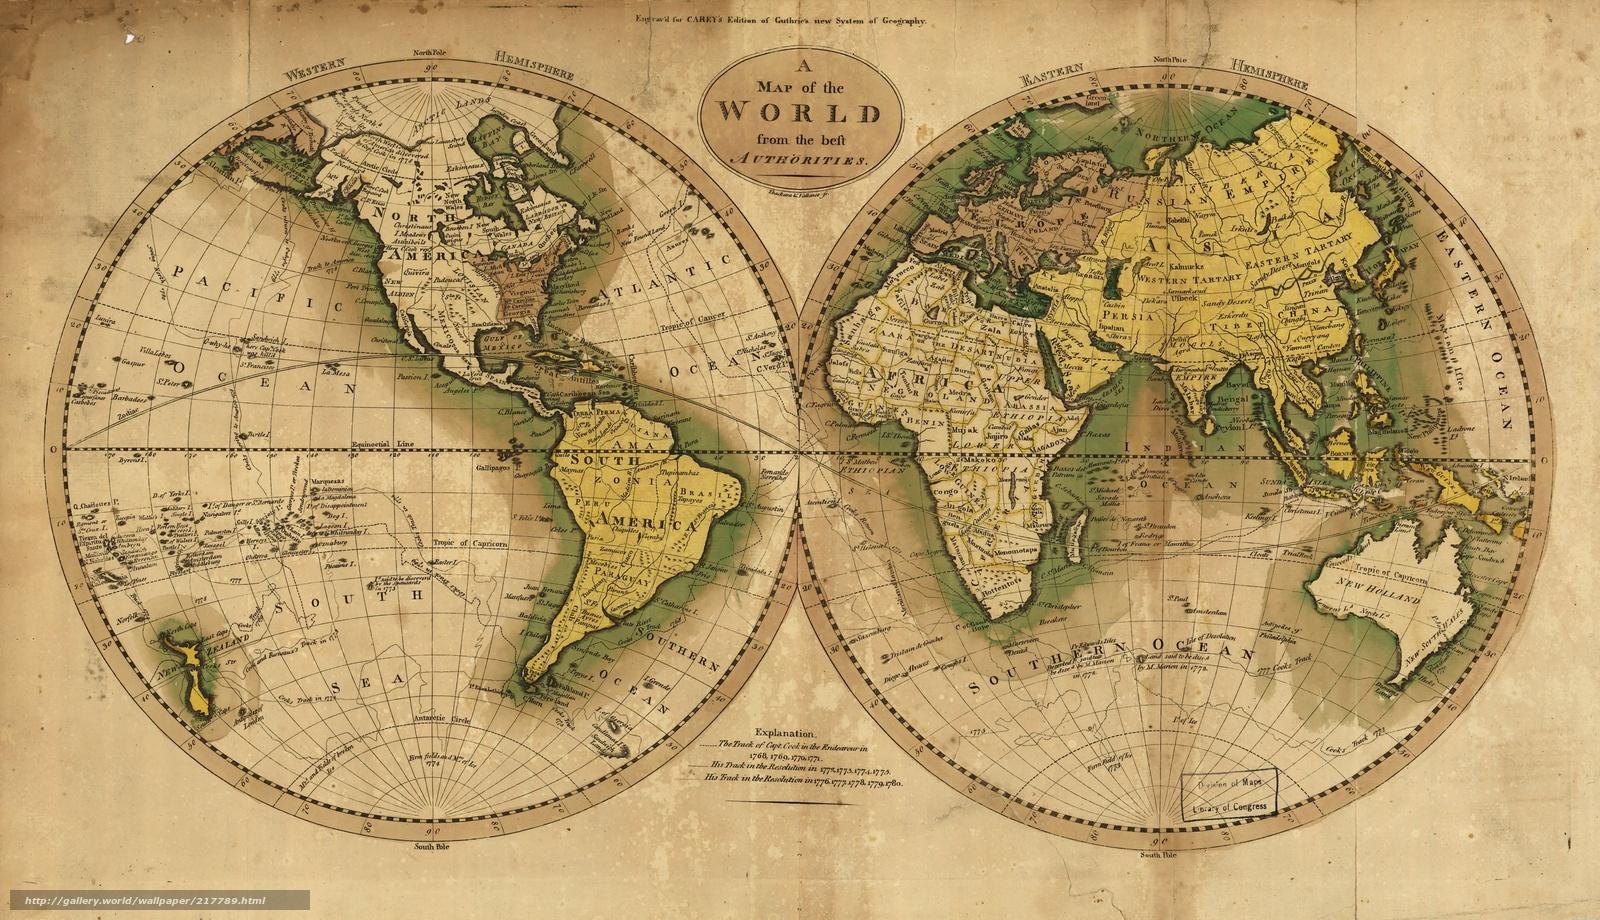 Old world map desktop wallpaper infovisual old world map desktop wallpaper gumiabroncs Choice Image